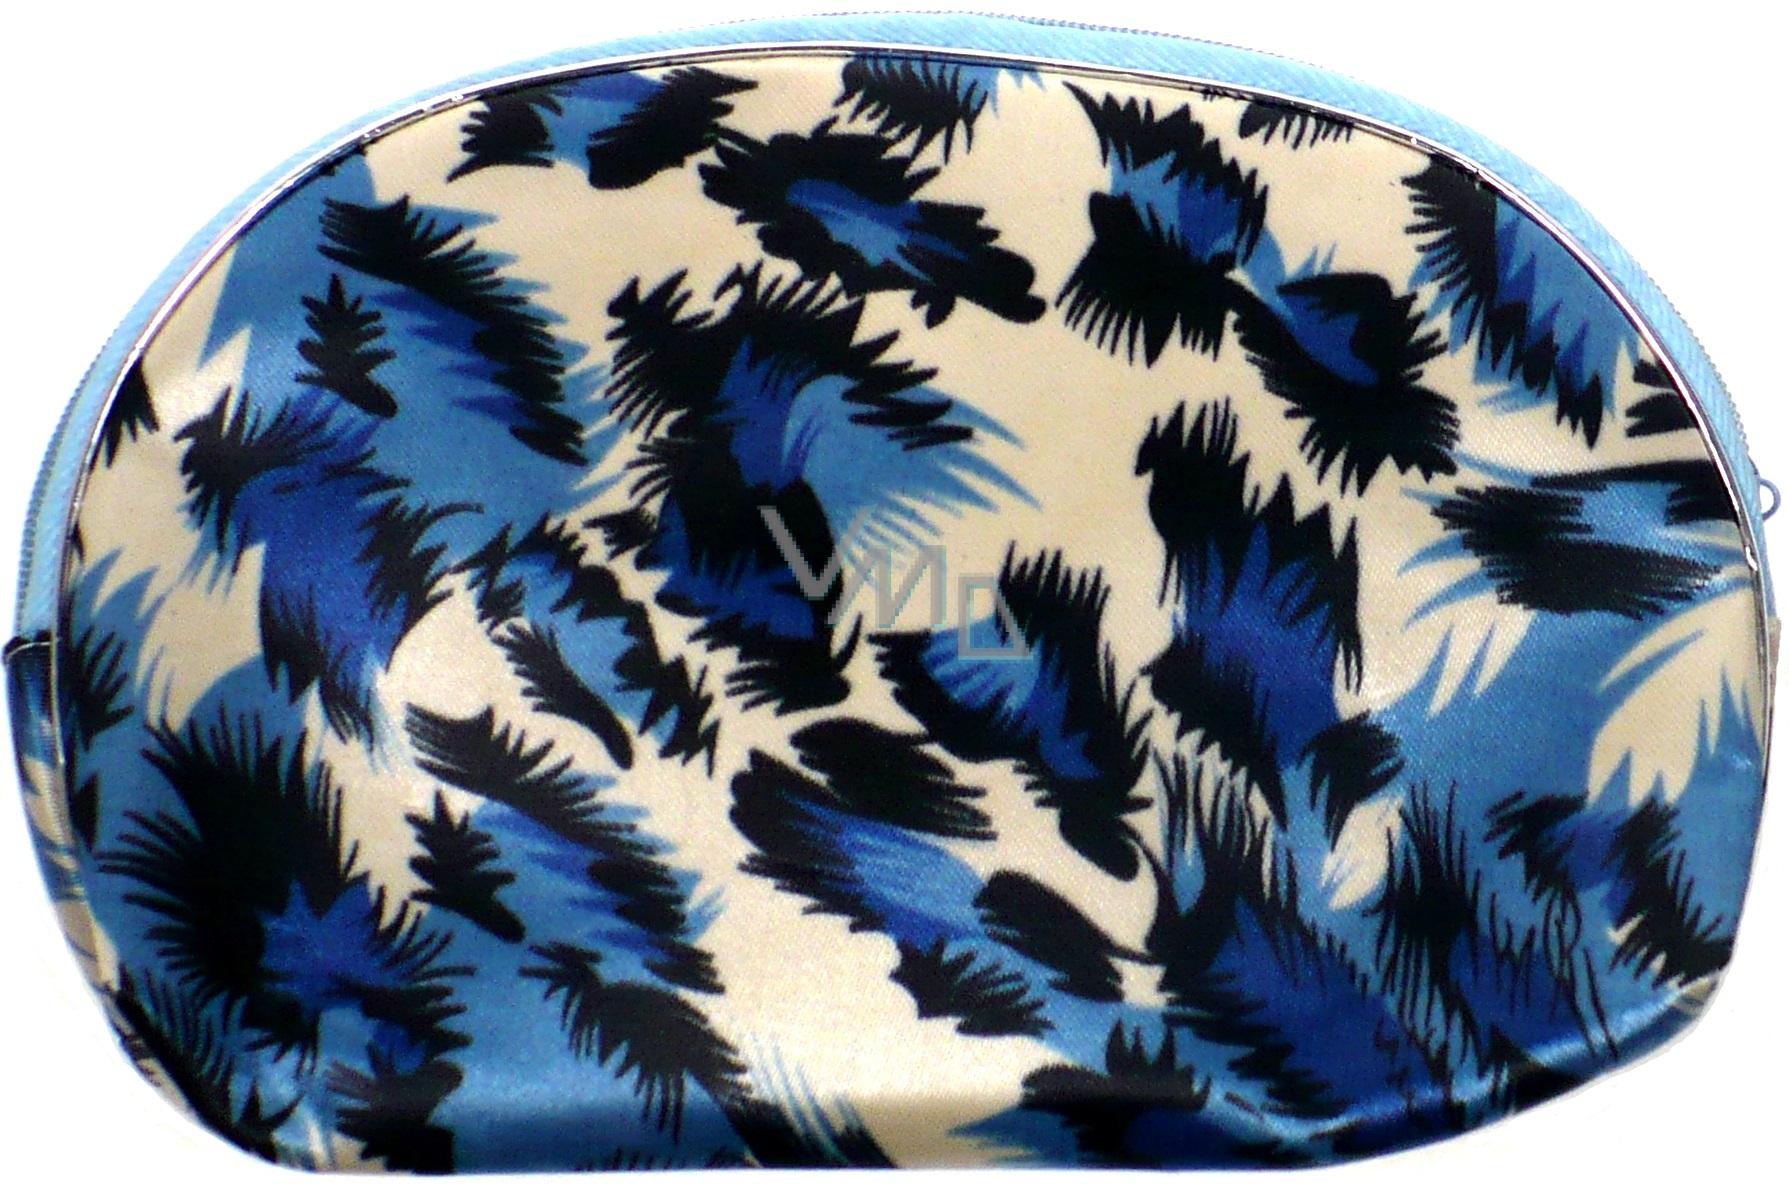 Etue Tygrovitá bílo-modro-černá 10,5 x 8 x 2 cm 1 kus 70080